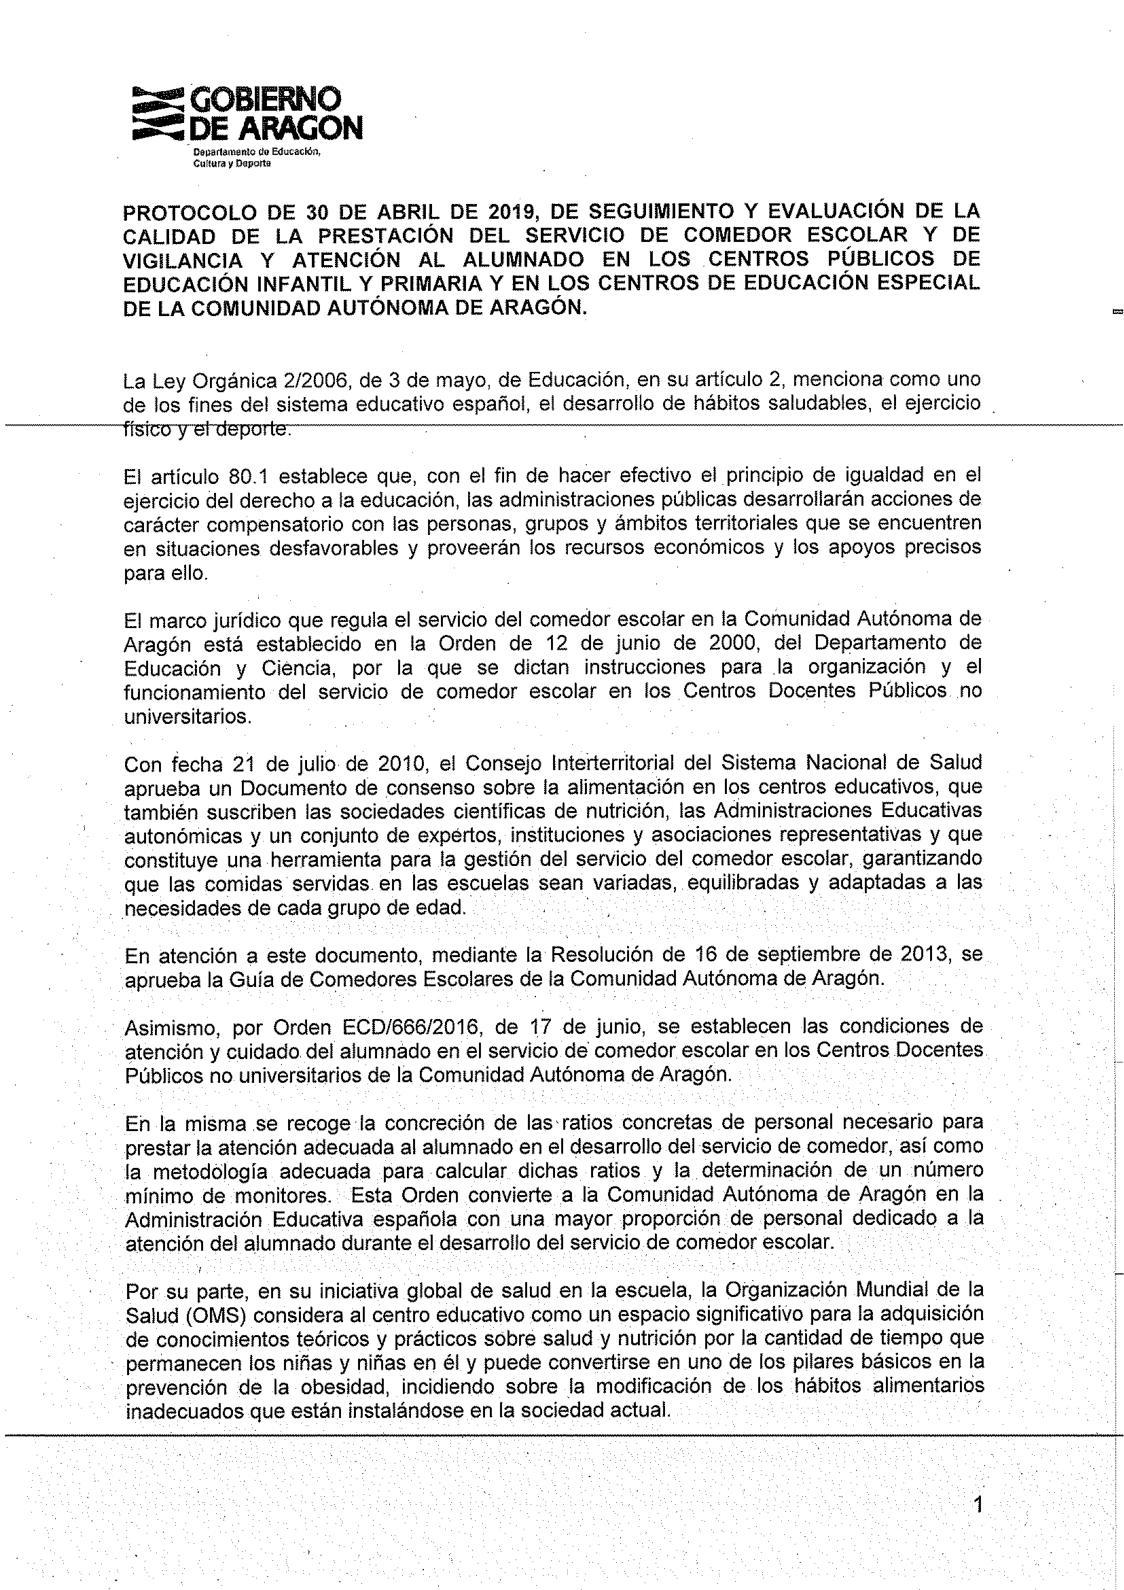 Calaméo - 29 Protocolo Calidad Comedores Escolares Dgpfp ...